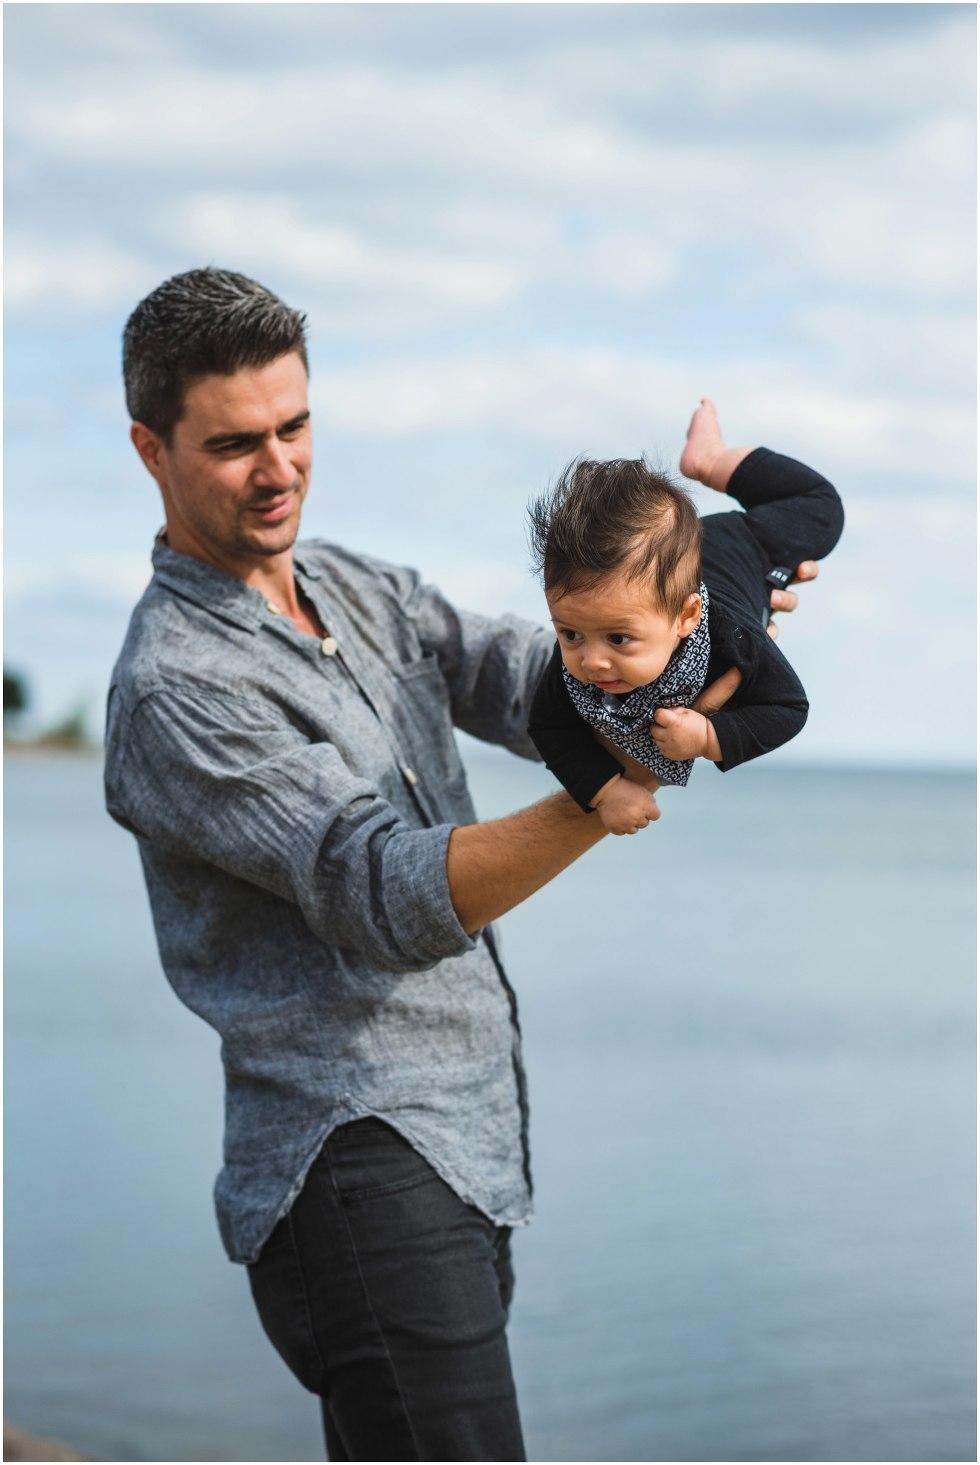 toronto beaches photographer for families, gillian foster photography